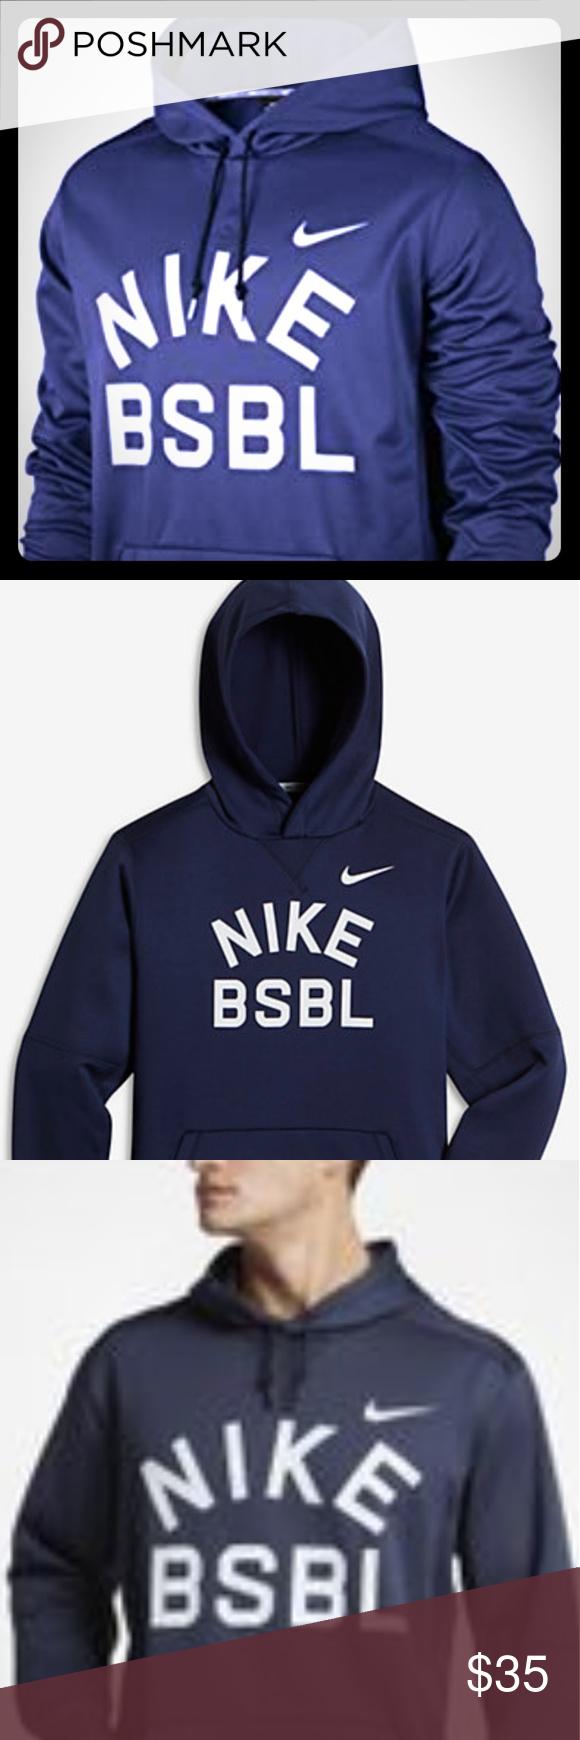 Nike Baseball Thermafit Hoodie Hoodies Sweatshirt Shirt Nike [ 1740 x 580 Pixel ]